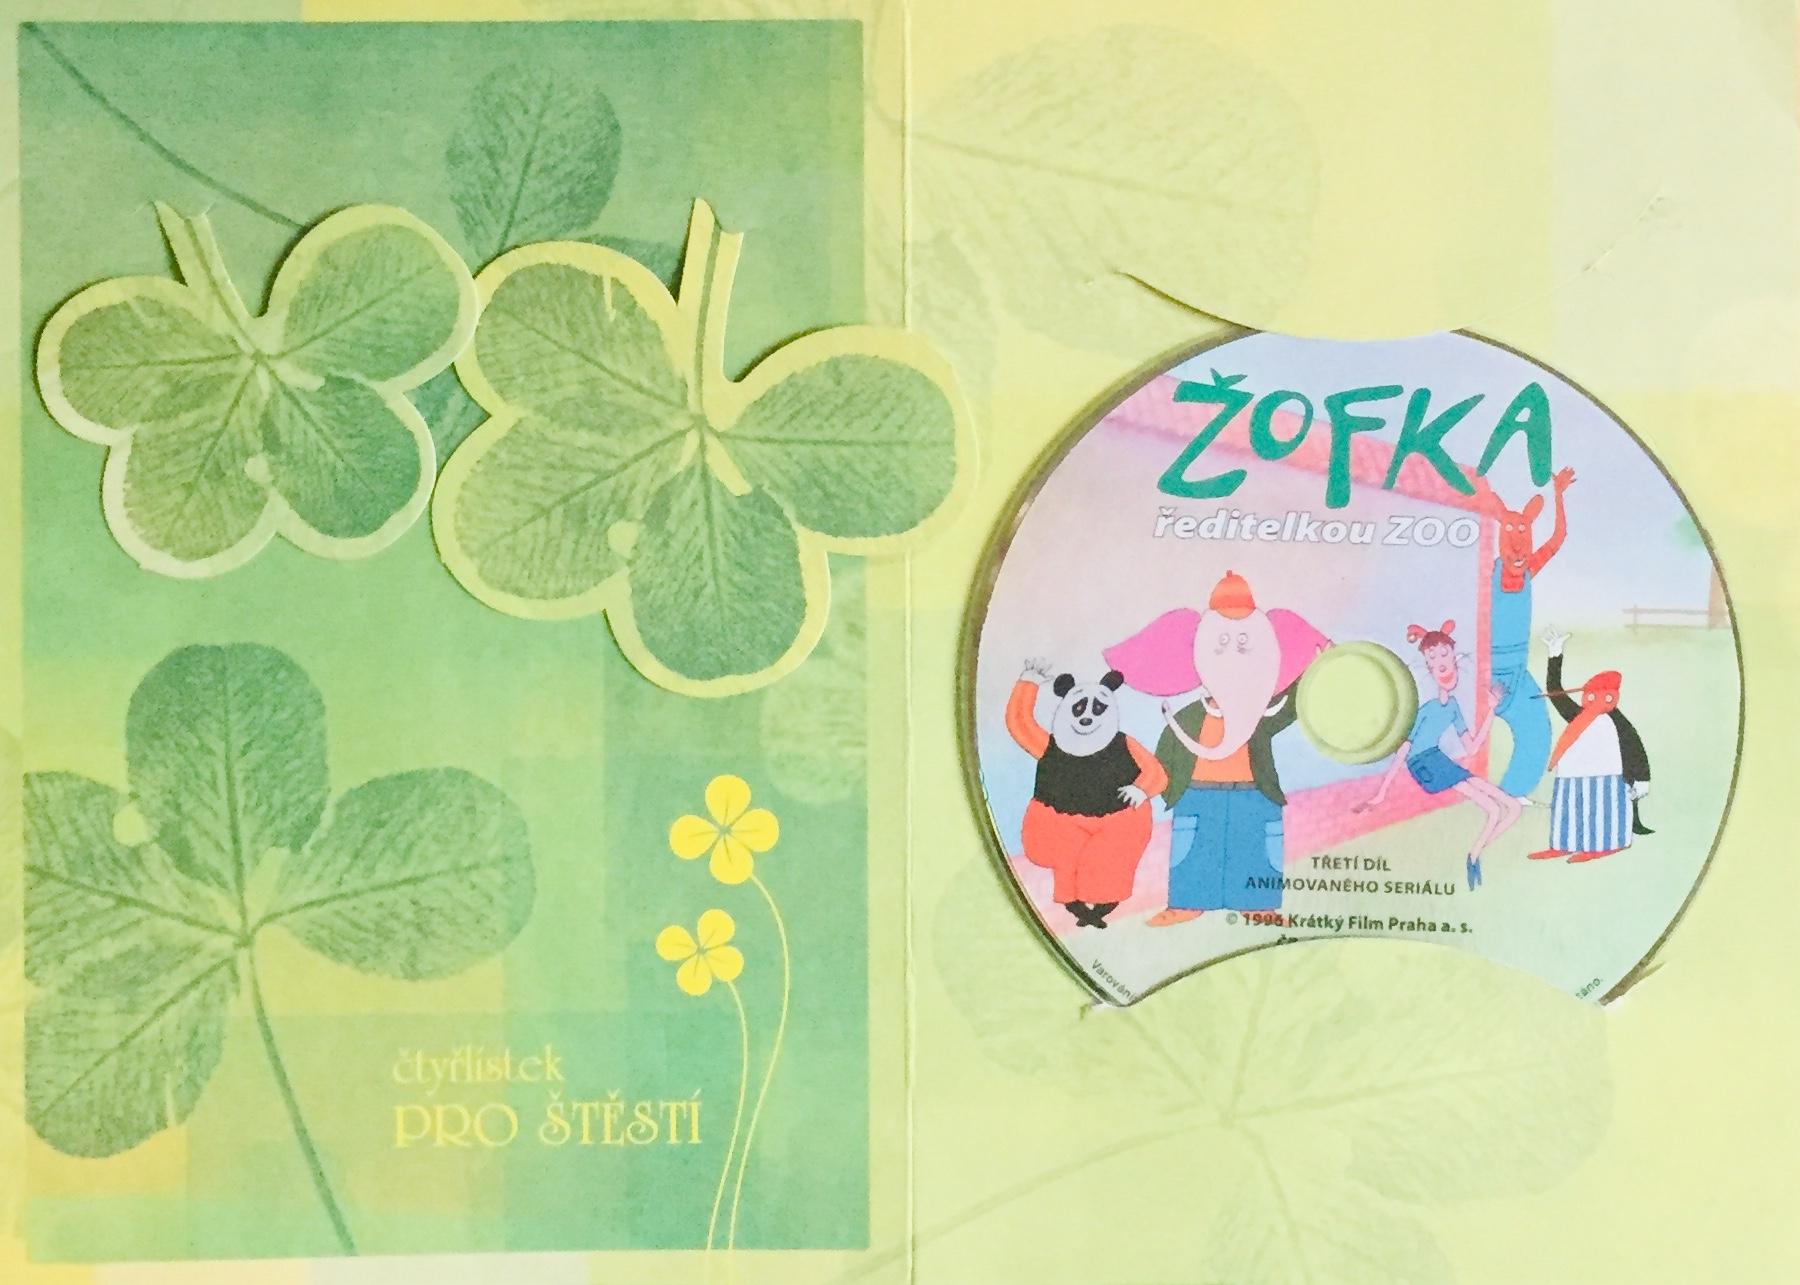 Žofka ředitelkou ZOO - DVD /dárkový obal/